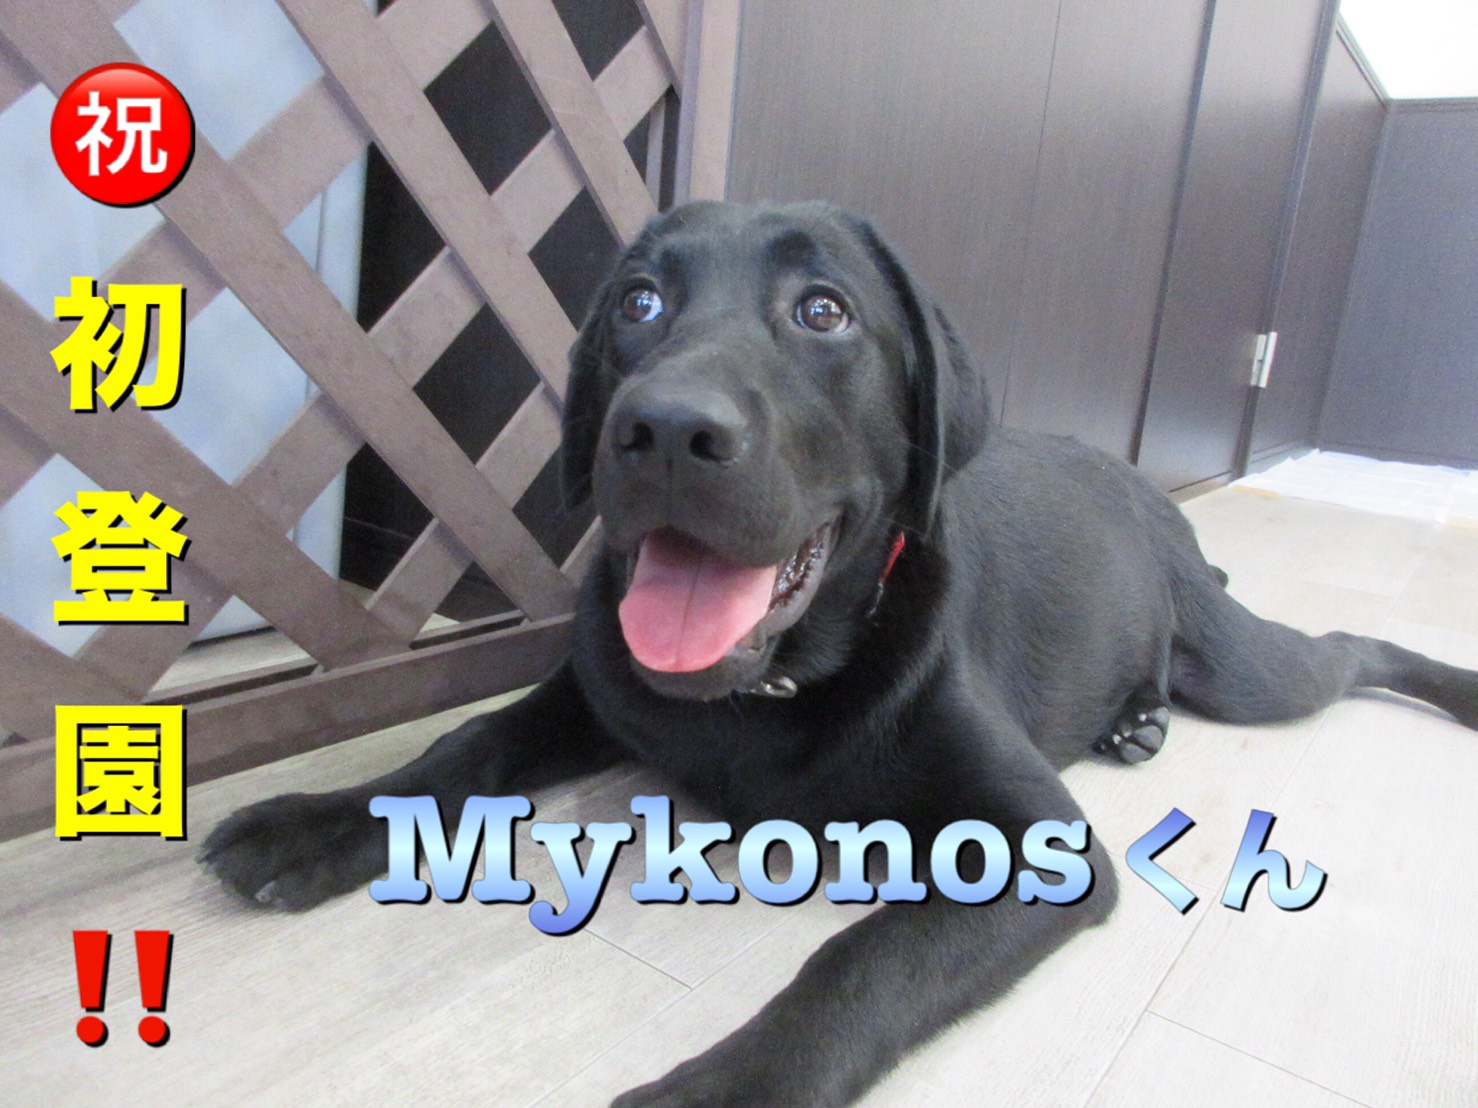 Mykonosくん・犬の保育園Baby・犬・犬のしつけ・犬の社会化・習志野市・八千代市・船橋市